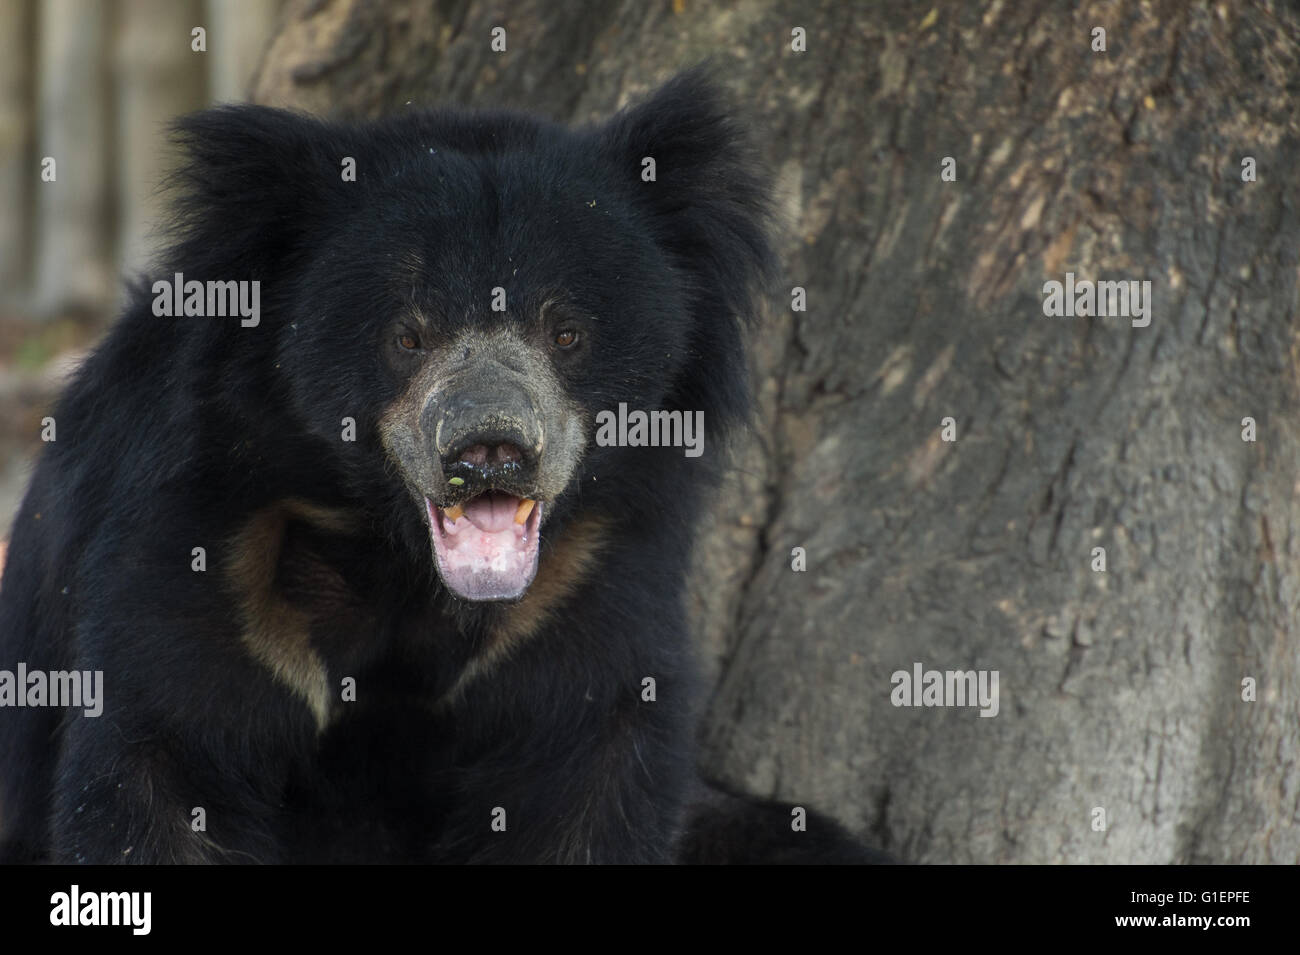 Loth bear, Melursus ursinus, Ursidae, Asia - Stock Image